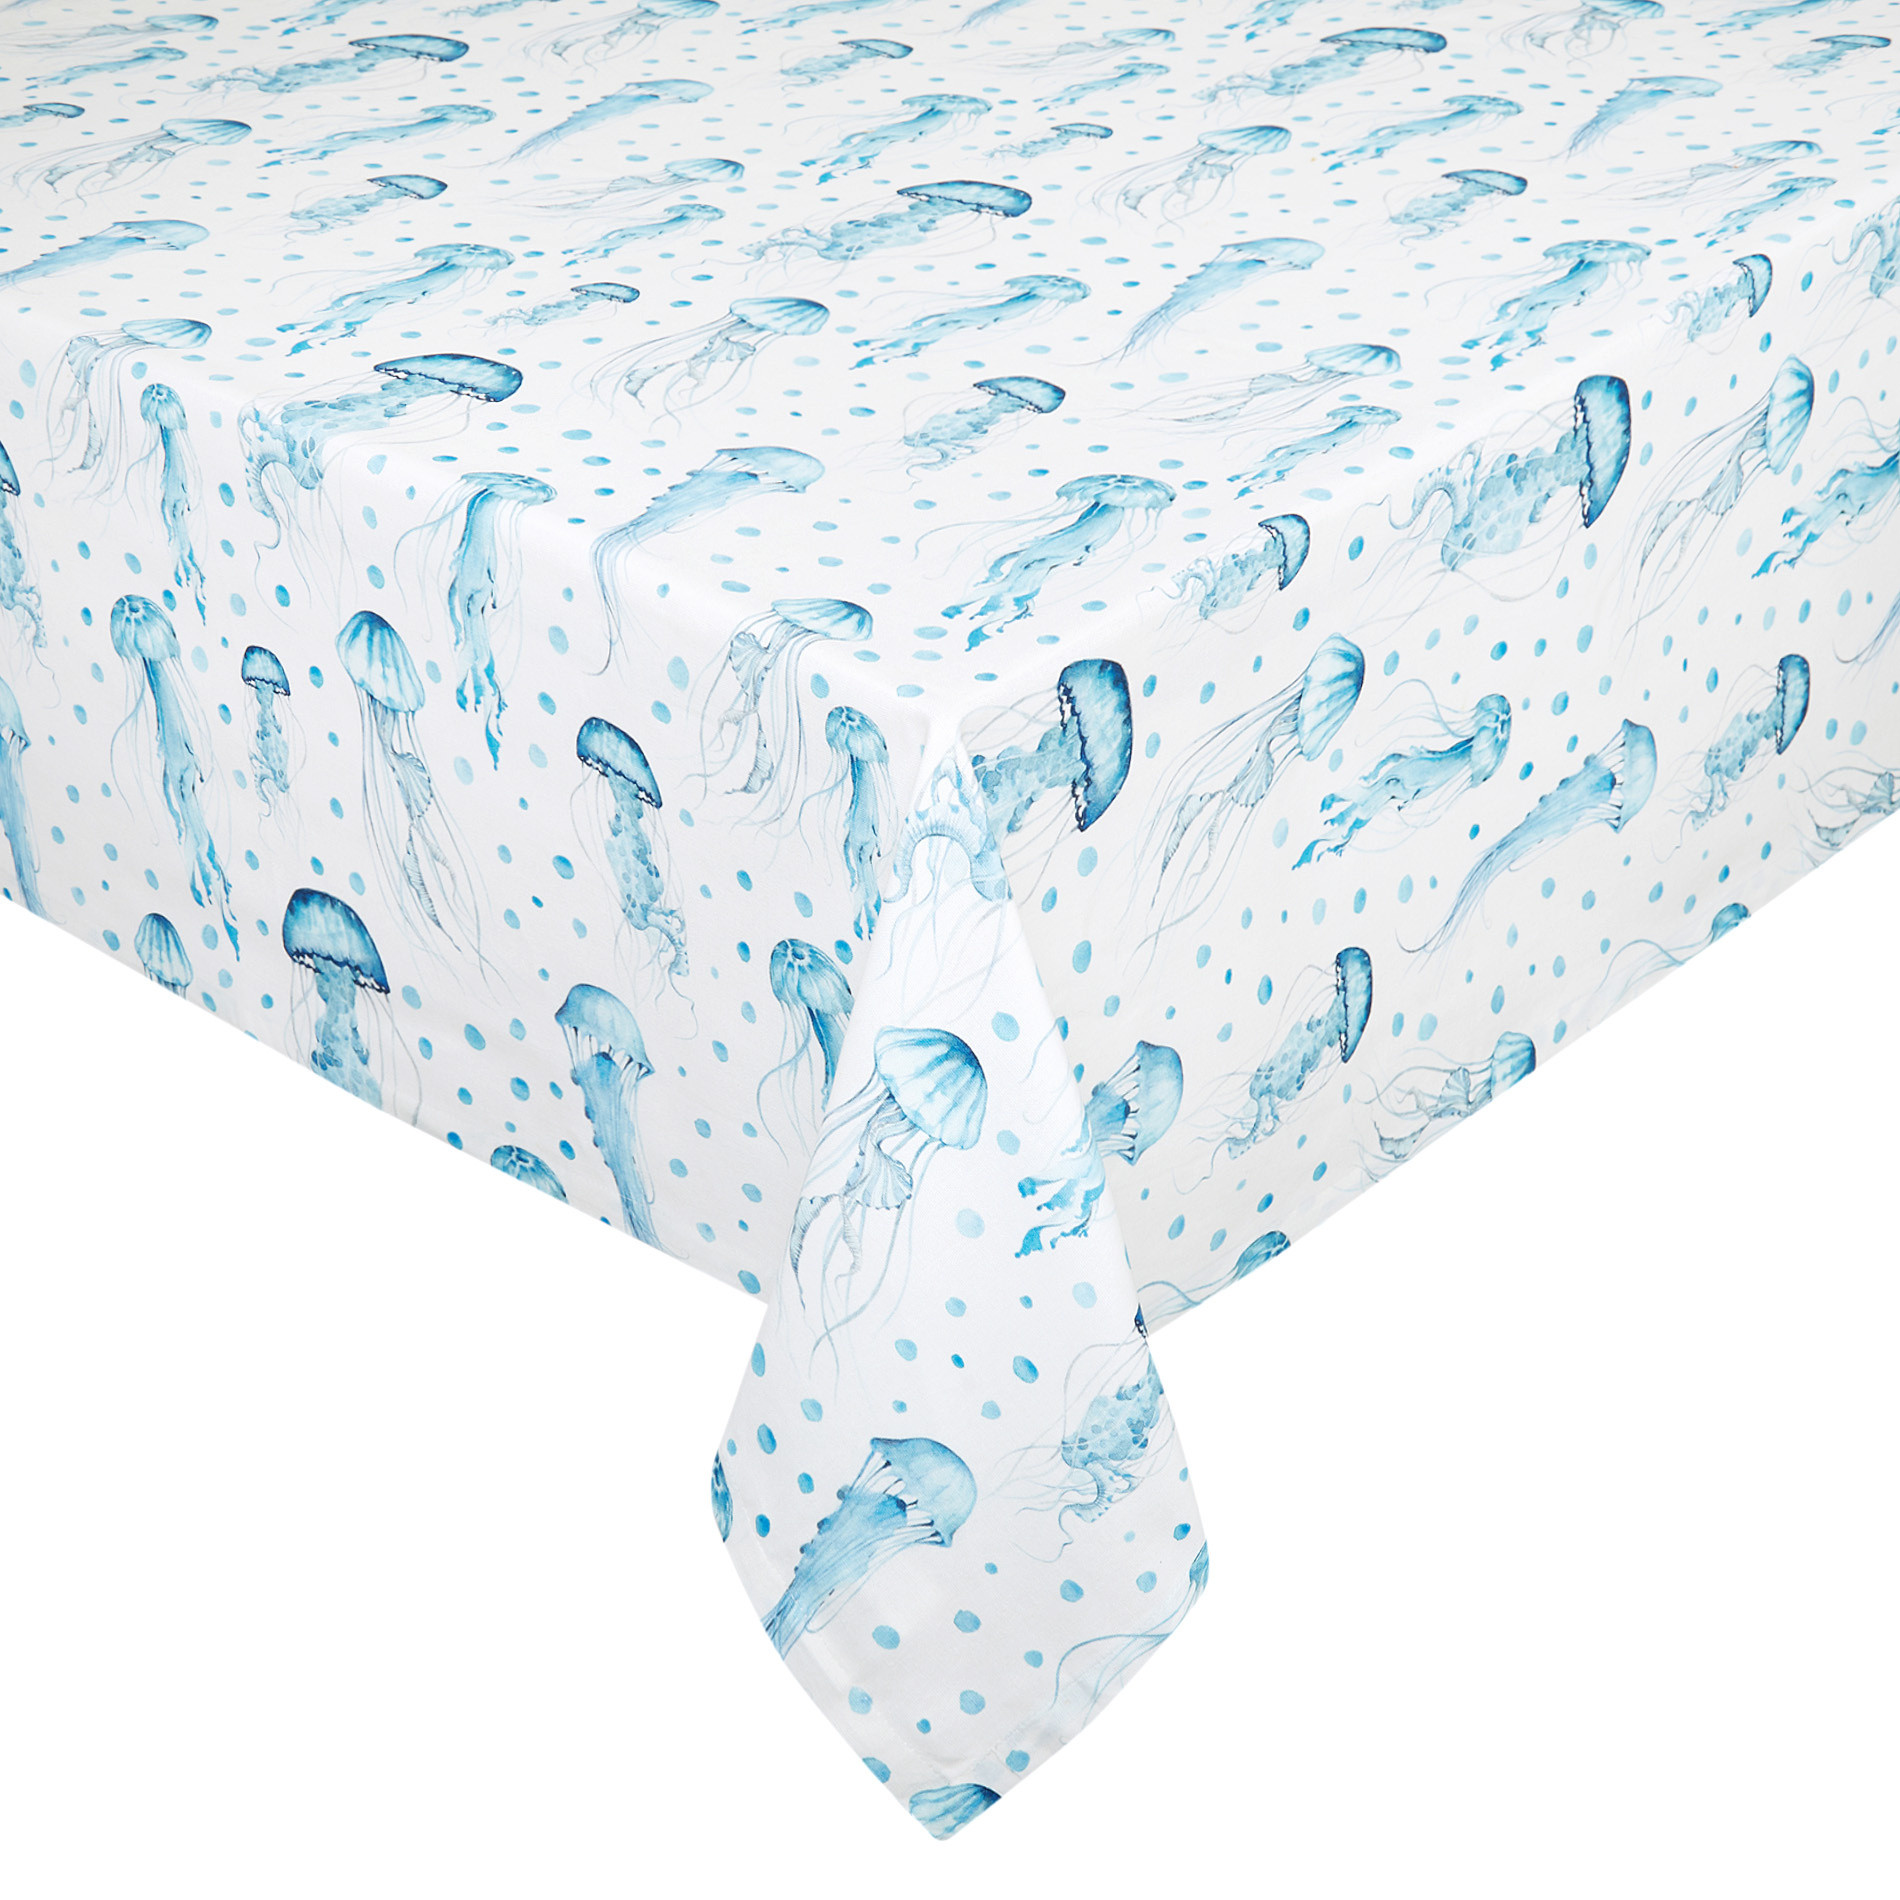 Tovaglia puro cotone organico idrorepellente stampa meduse, Bianco, large image number 0